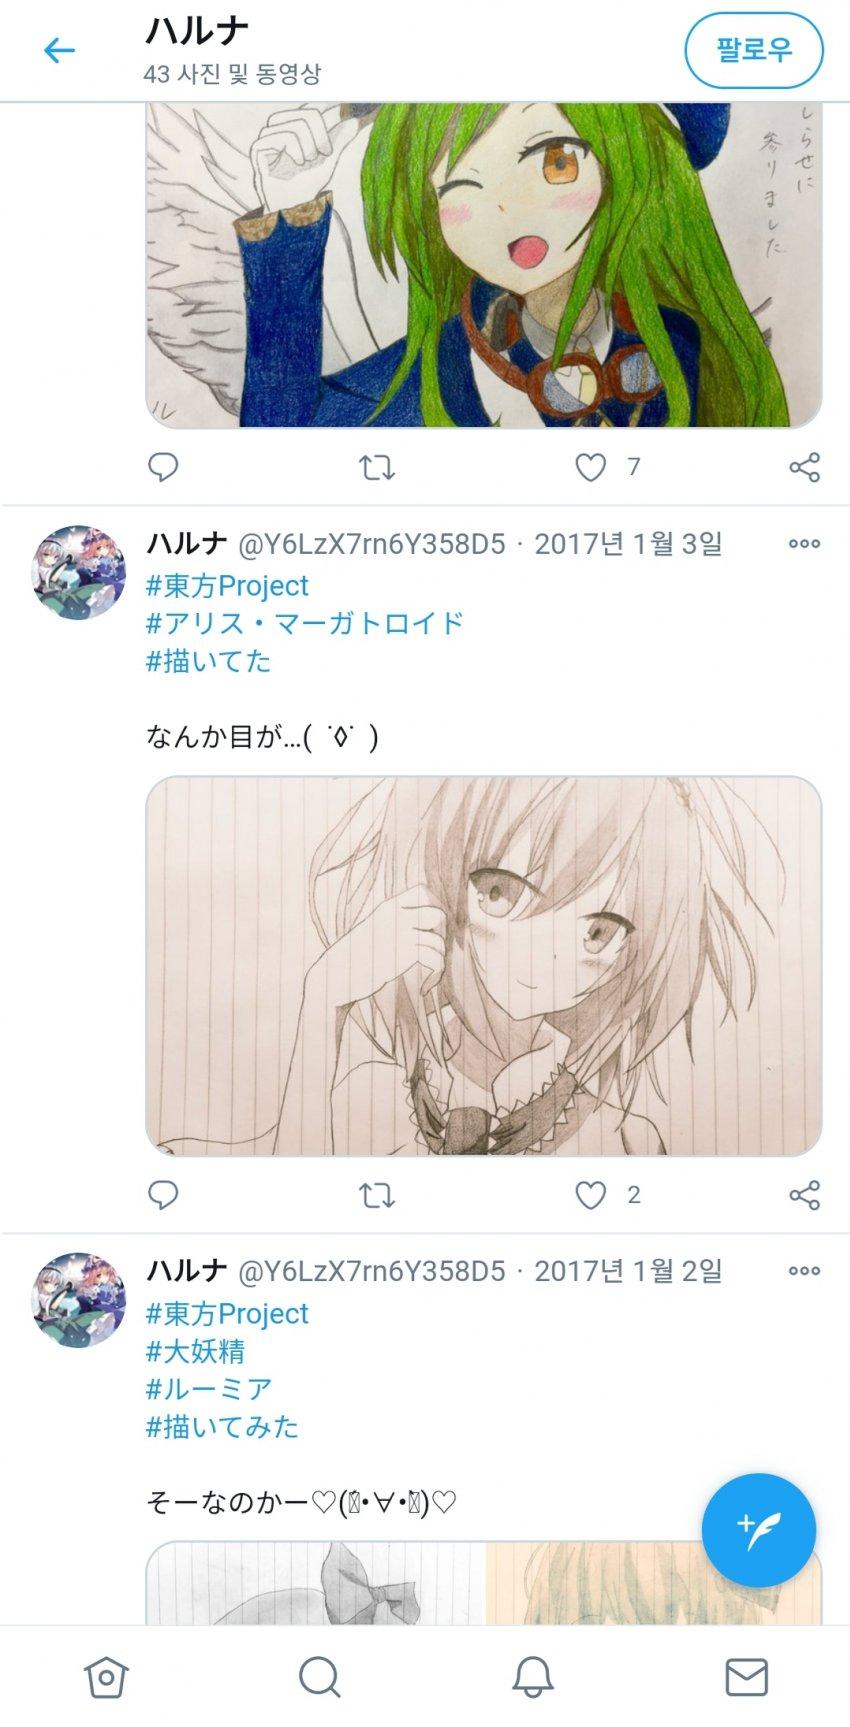 viewimage.php?no=24b0d769e1d32ca73dec84fa11d0283195504478ca9b7677dc322c30cb3c9b4116c190f6aad88dad339a11d000d61232159e81d752aa691f2907e054e716de89affbd8ca68f499192ee0ddb9f0335dfa2df13487a9359c1a4face94e6d4fa851b9fdd33b908384a119